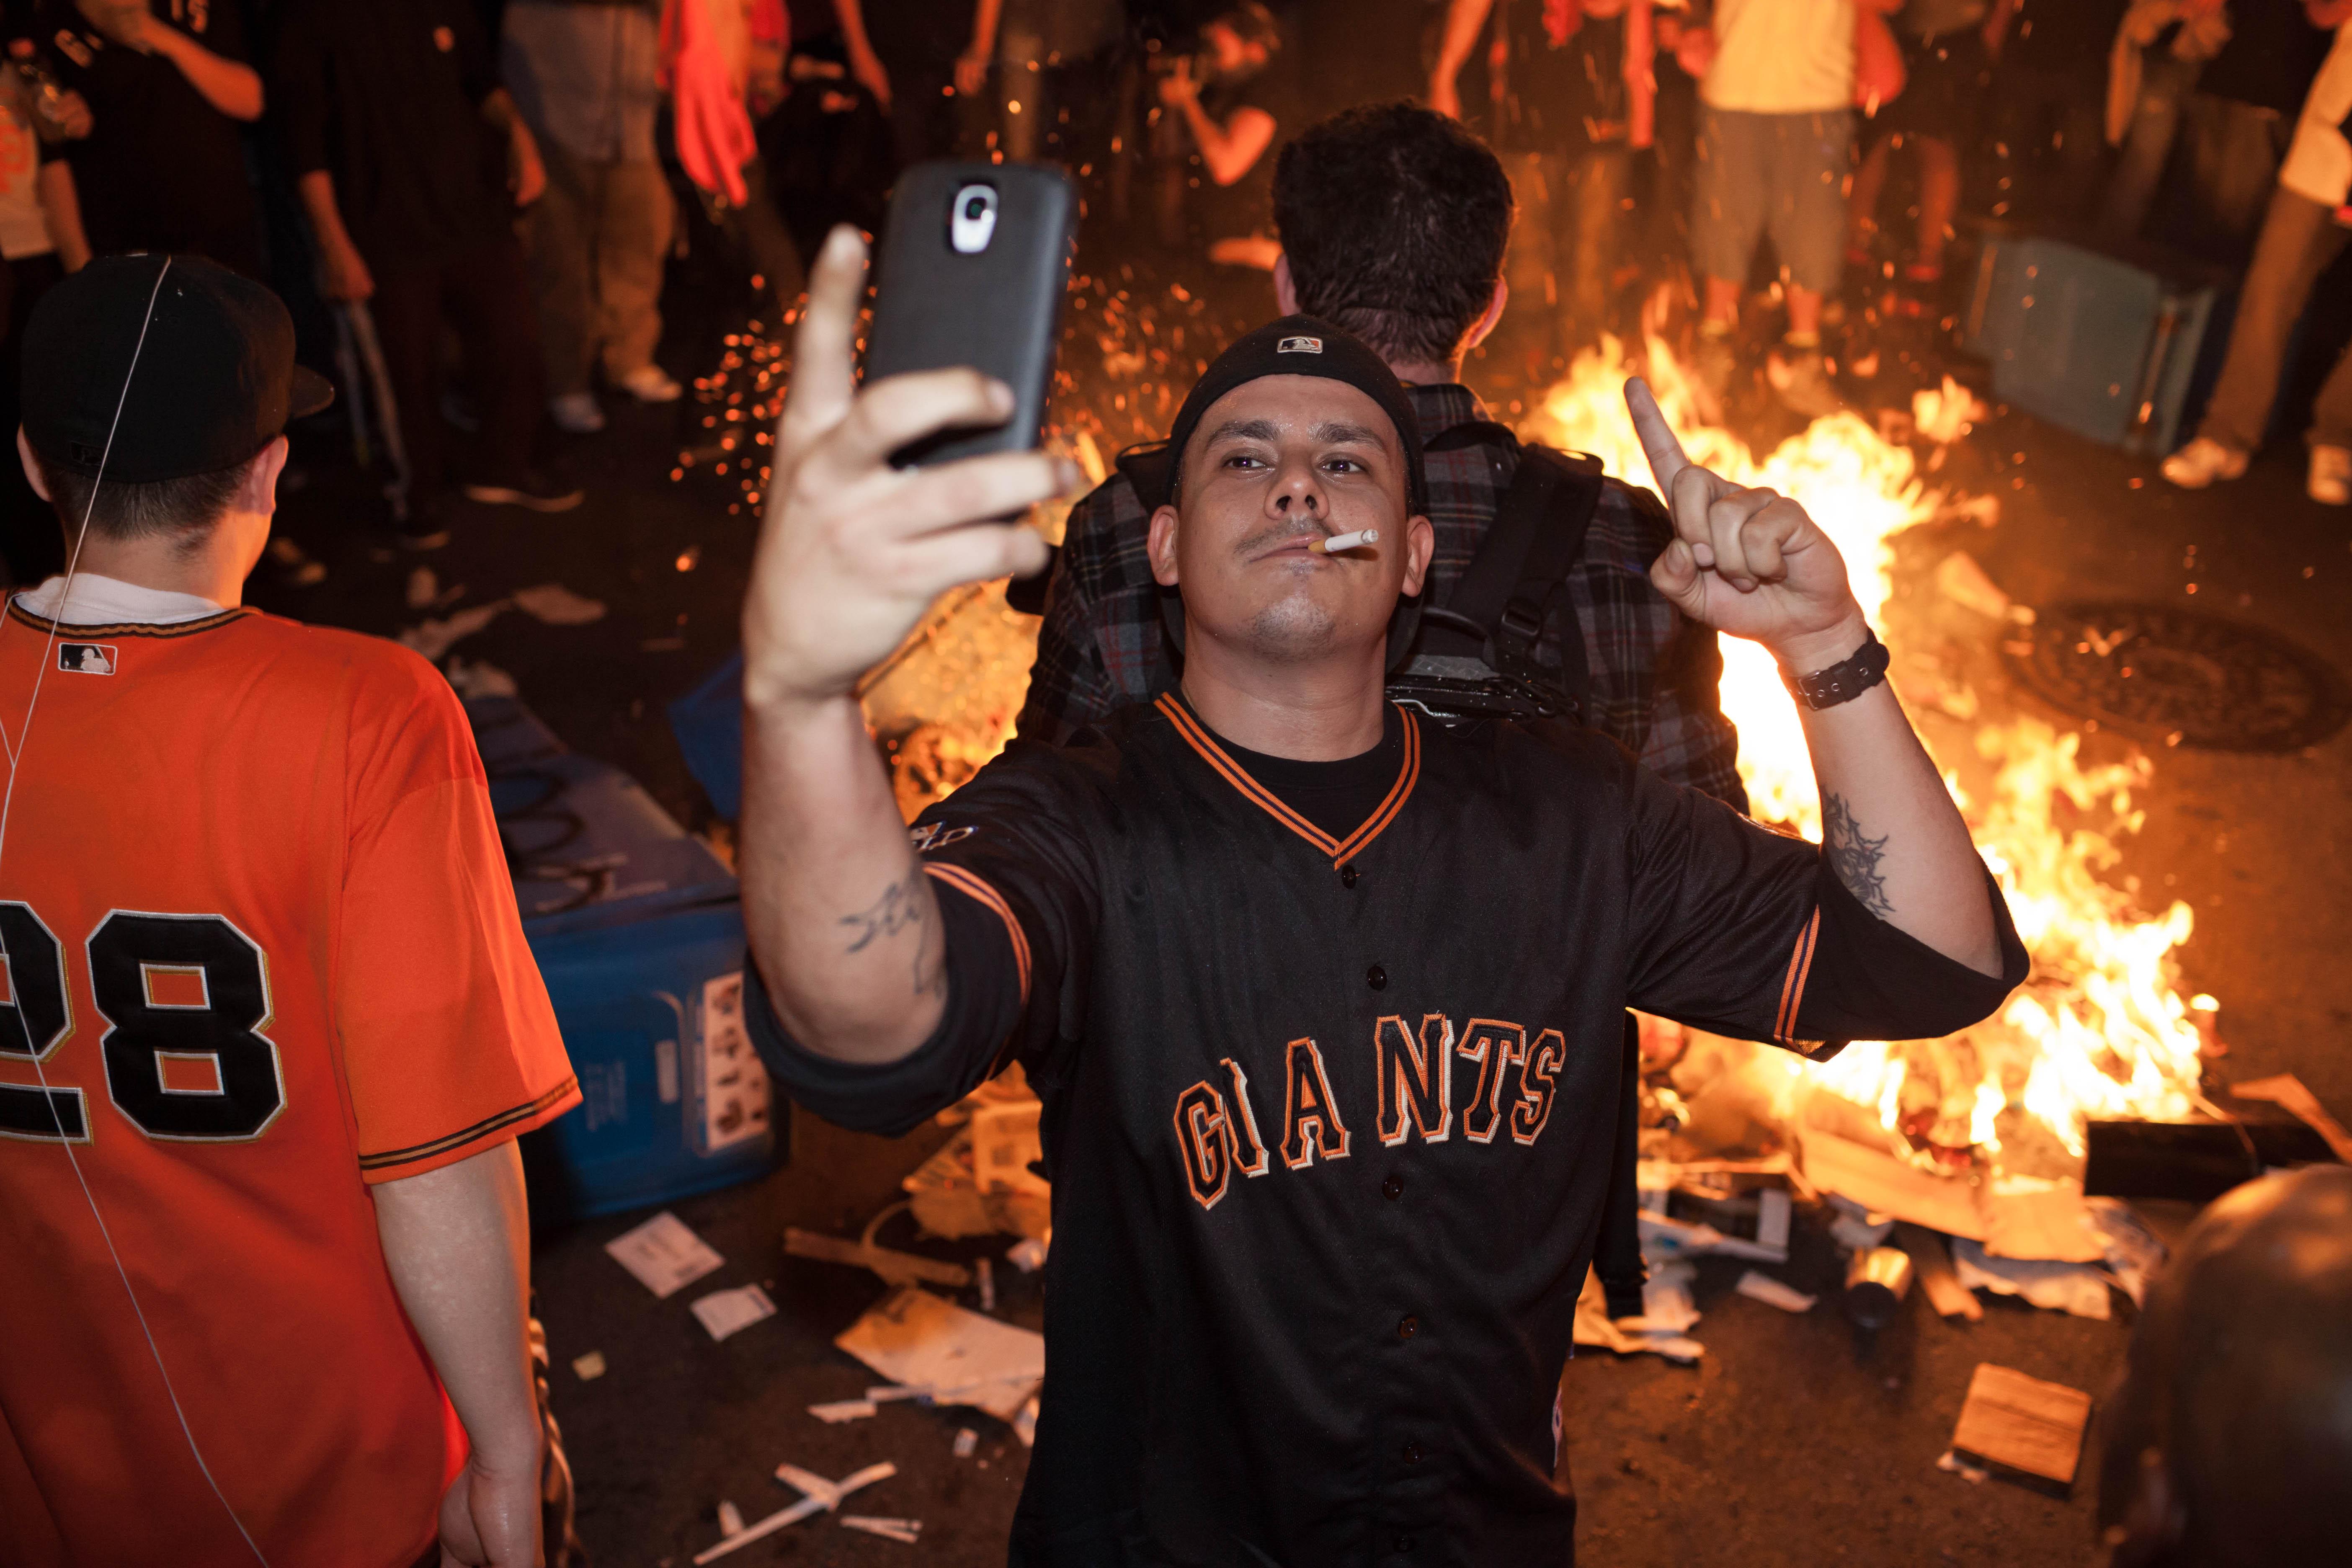 File:Man with cigarette taking selfie - San Francisco Giants